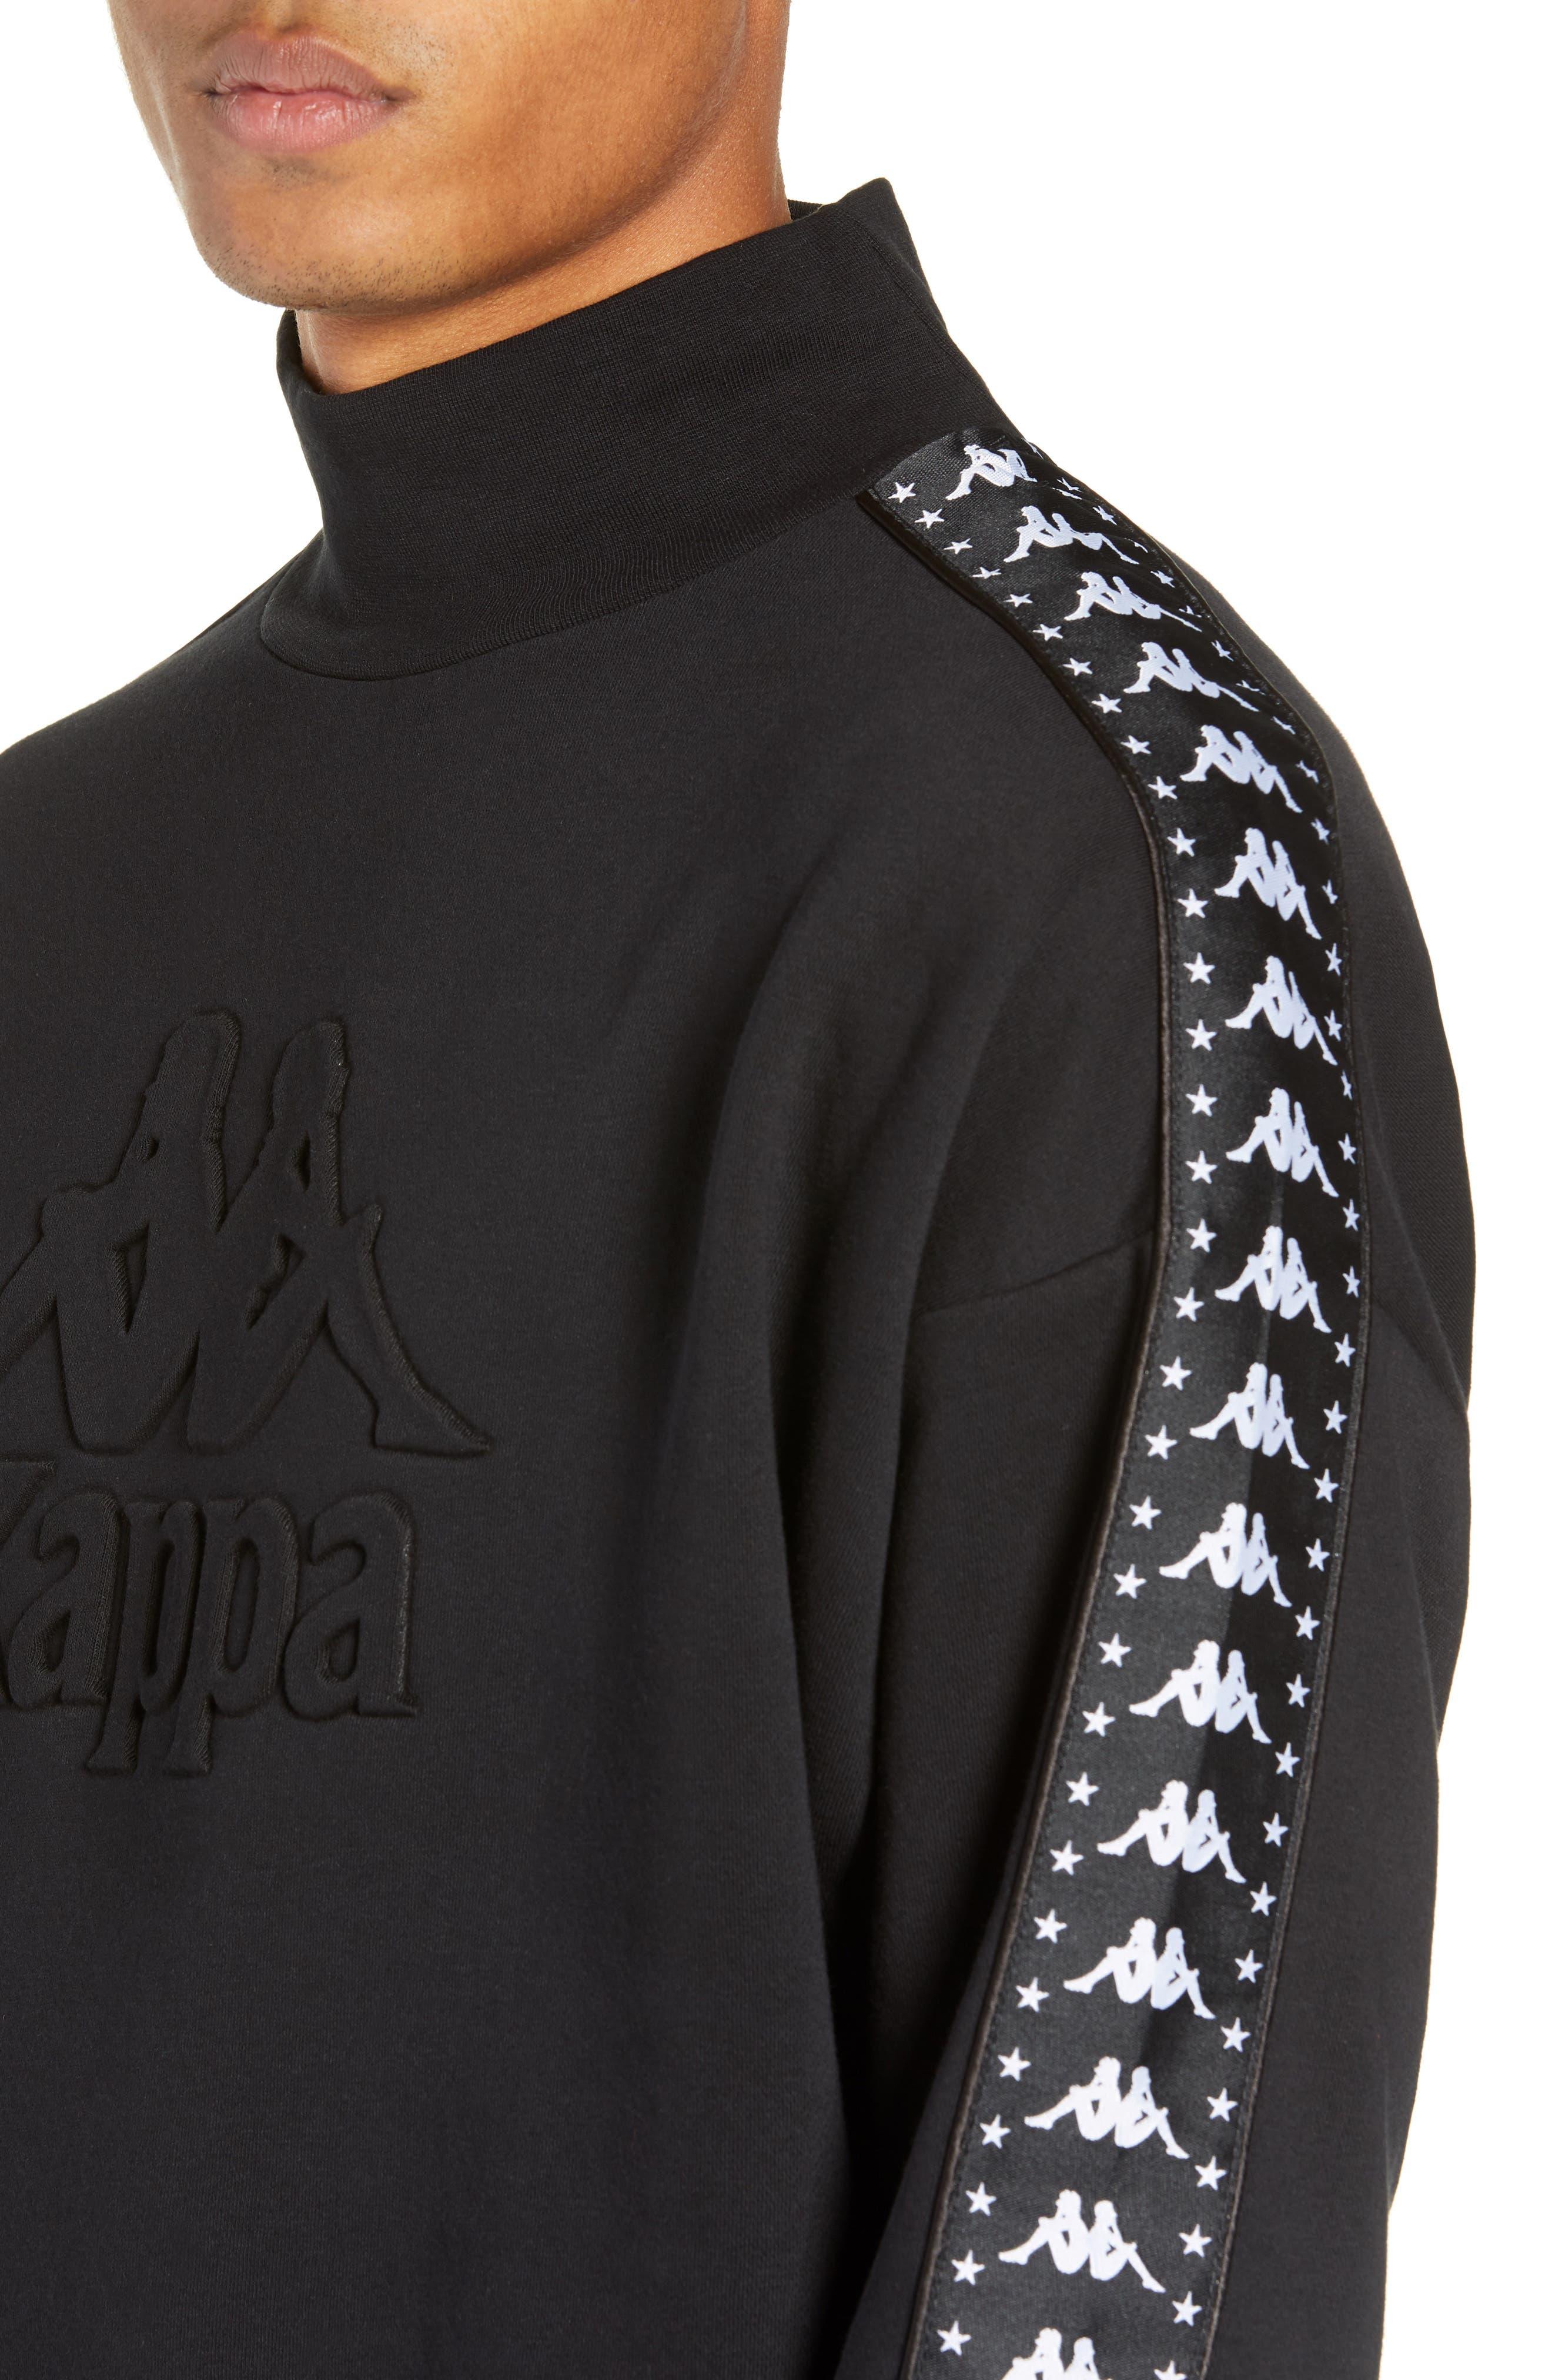 Authentic Alef Mock Neck Sweatshirt,                             Alternate thumbnail 4, color,                             BLACK/ WHITE